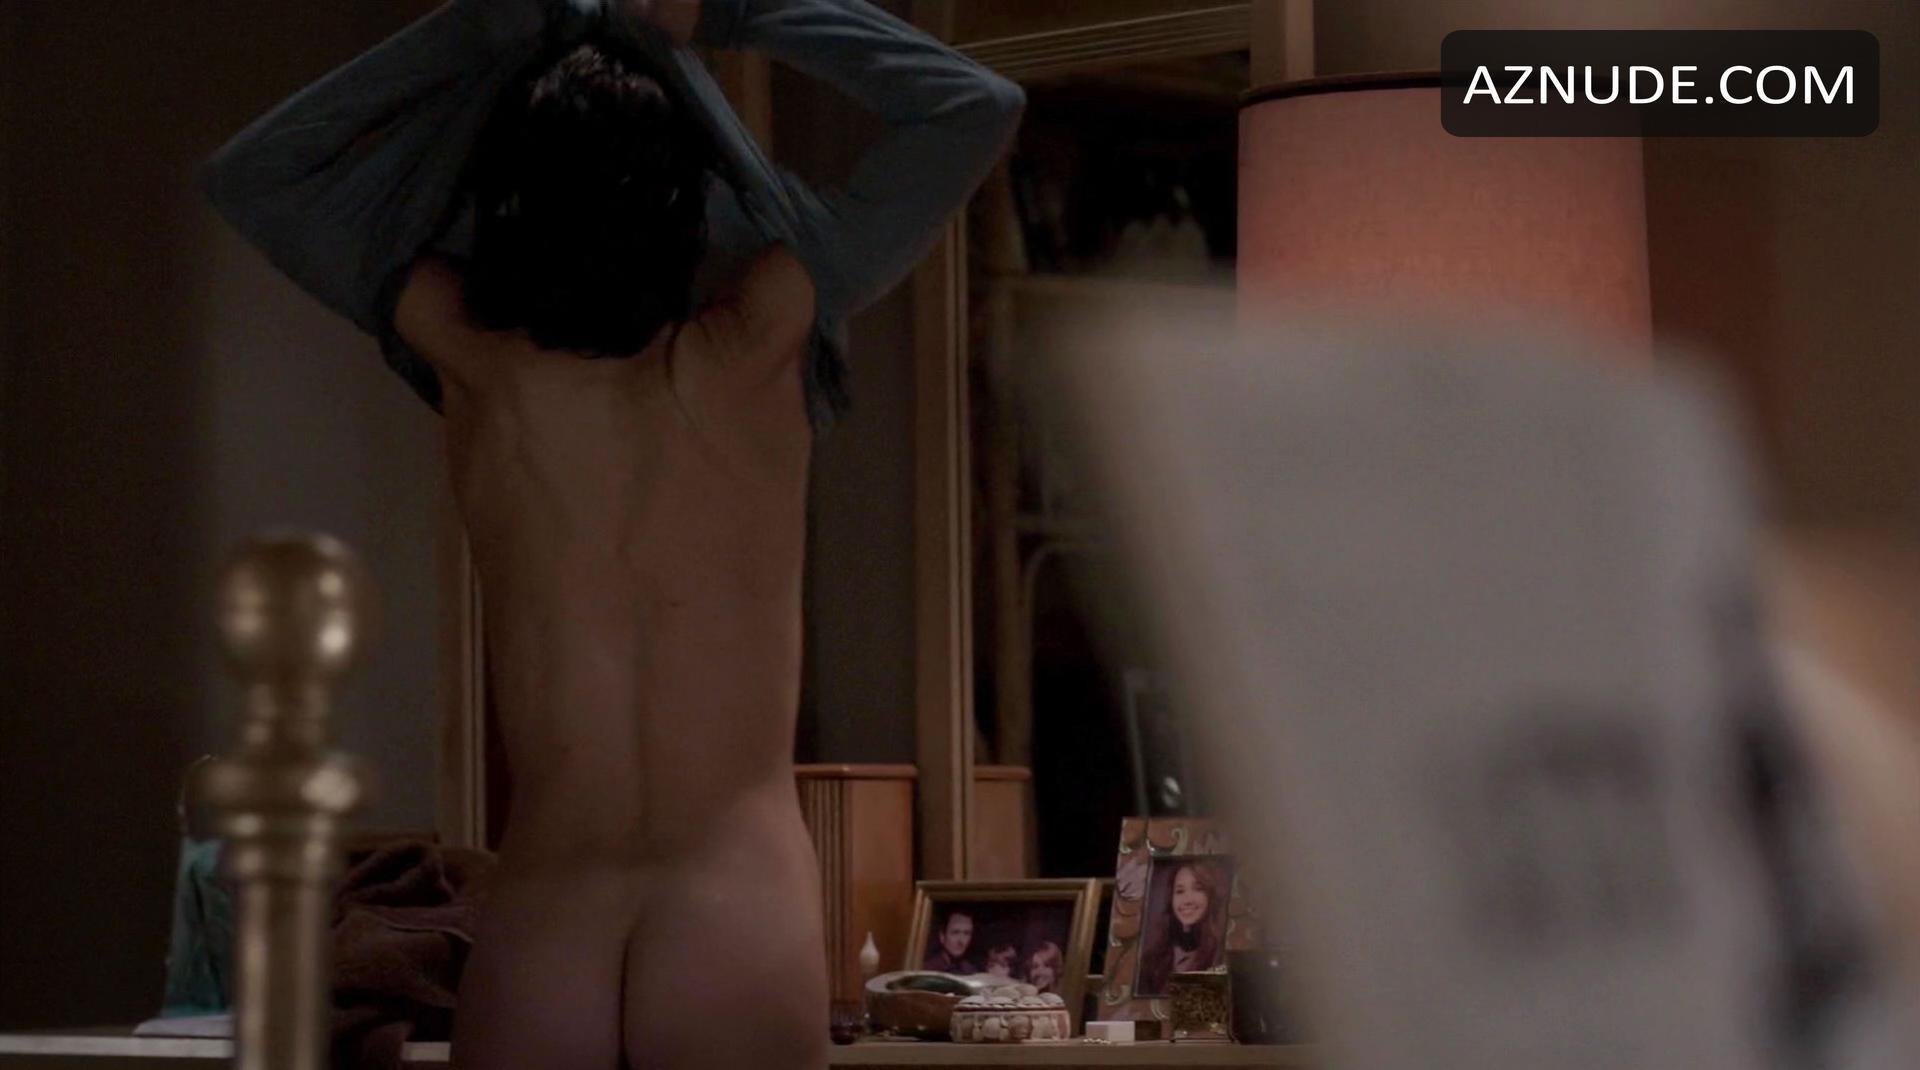 Russell americans nude scene keri